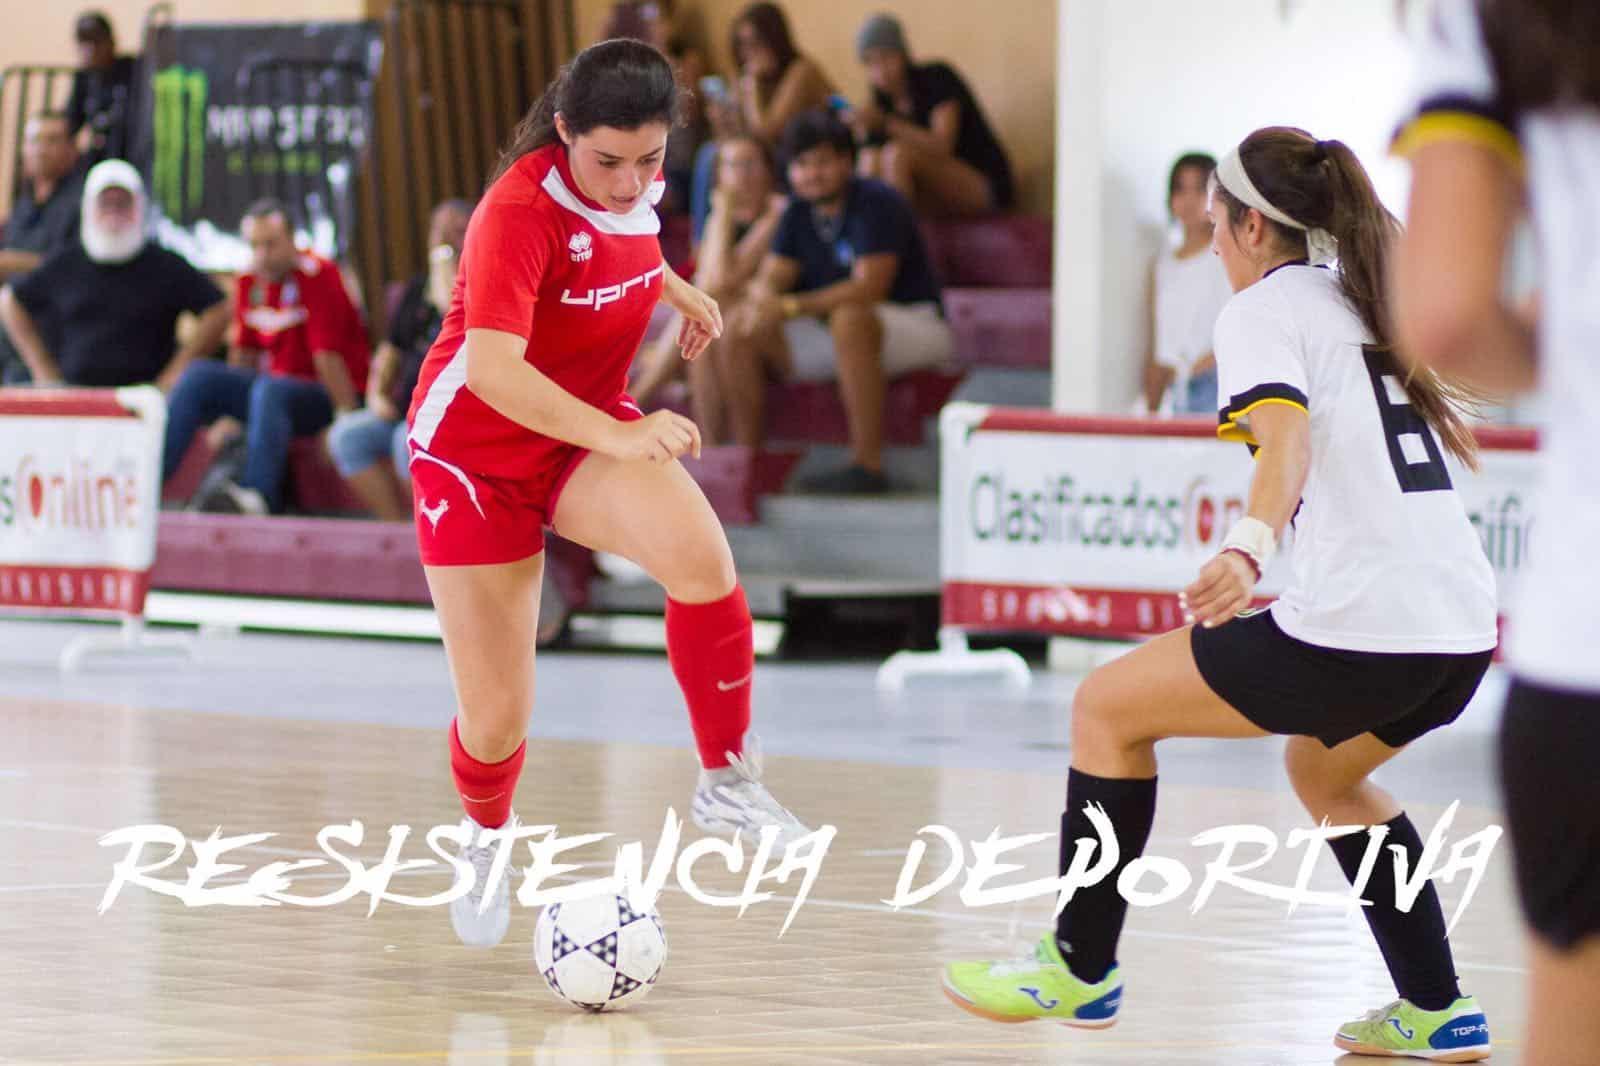 Resistencia Deportiva